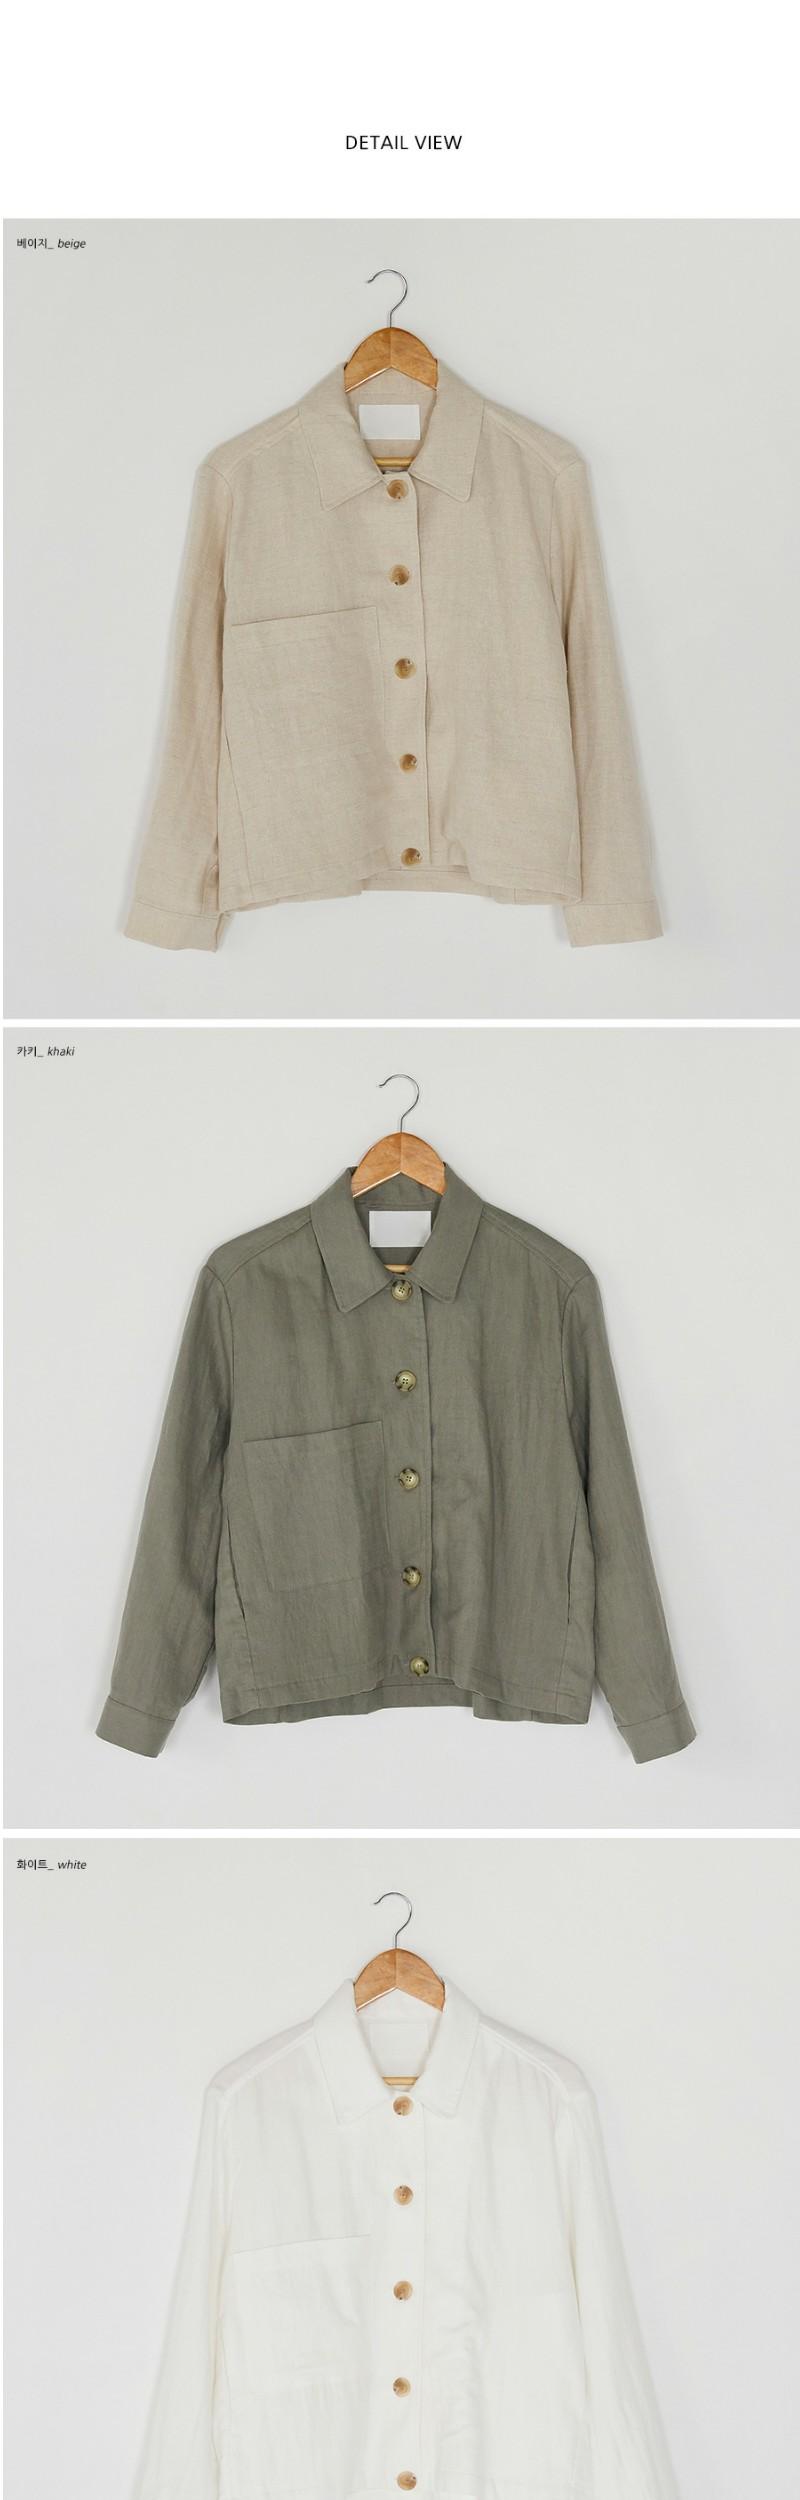 one pocket linen jacket